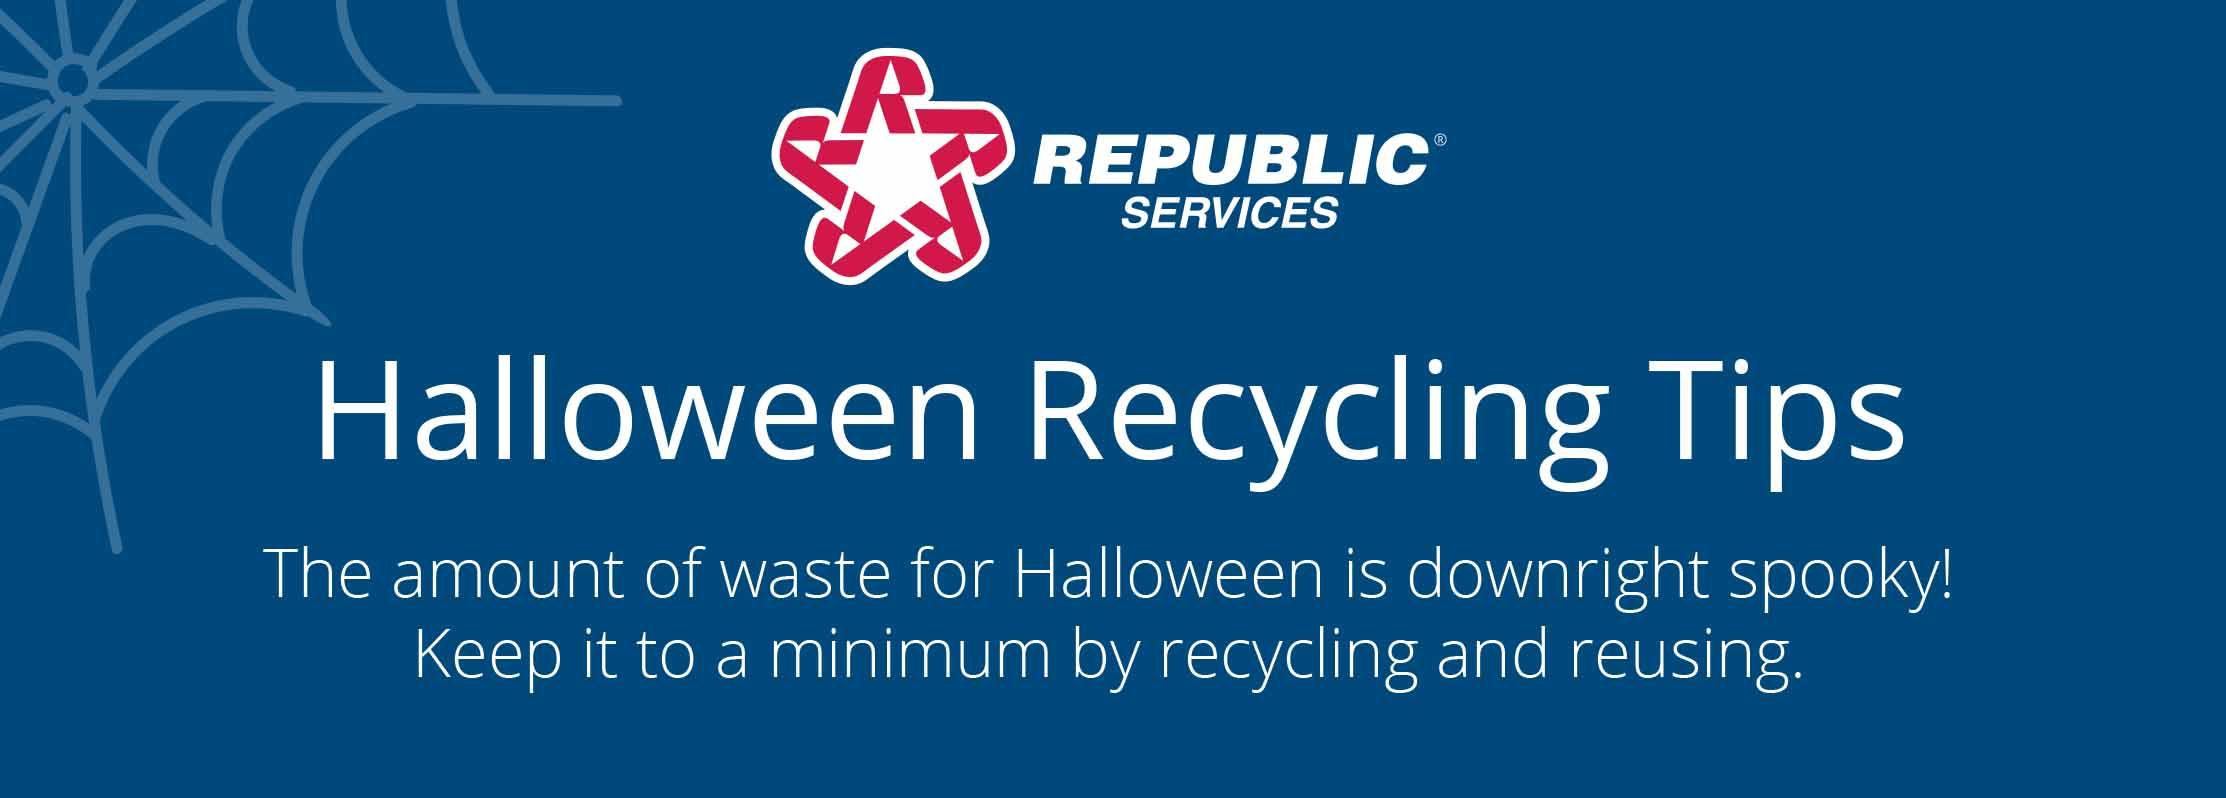 Halloween Recycling Tips art